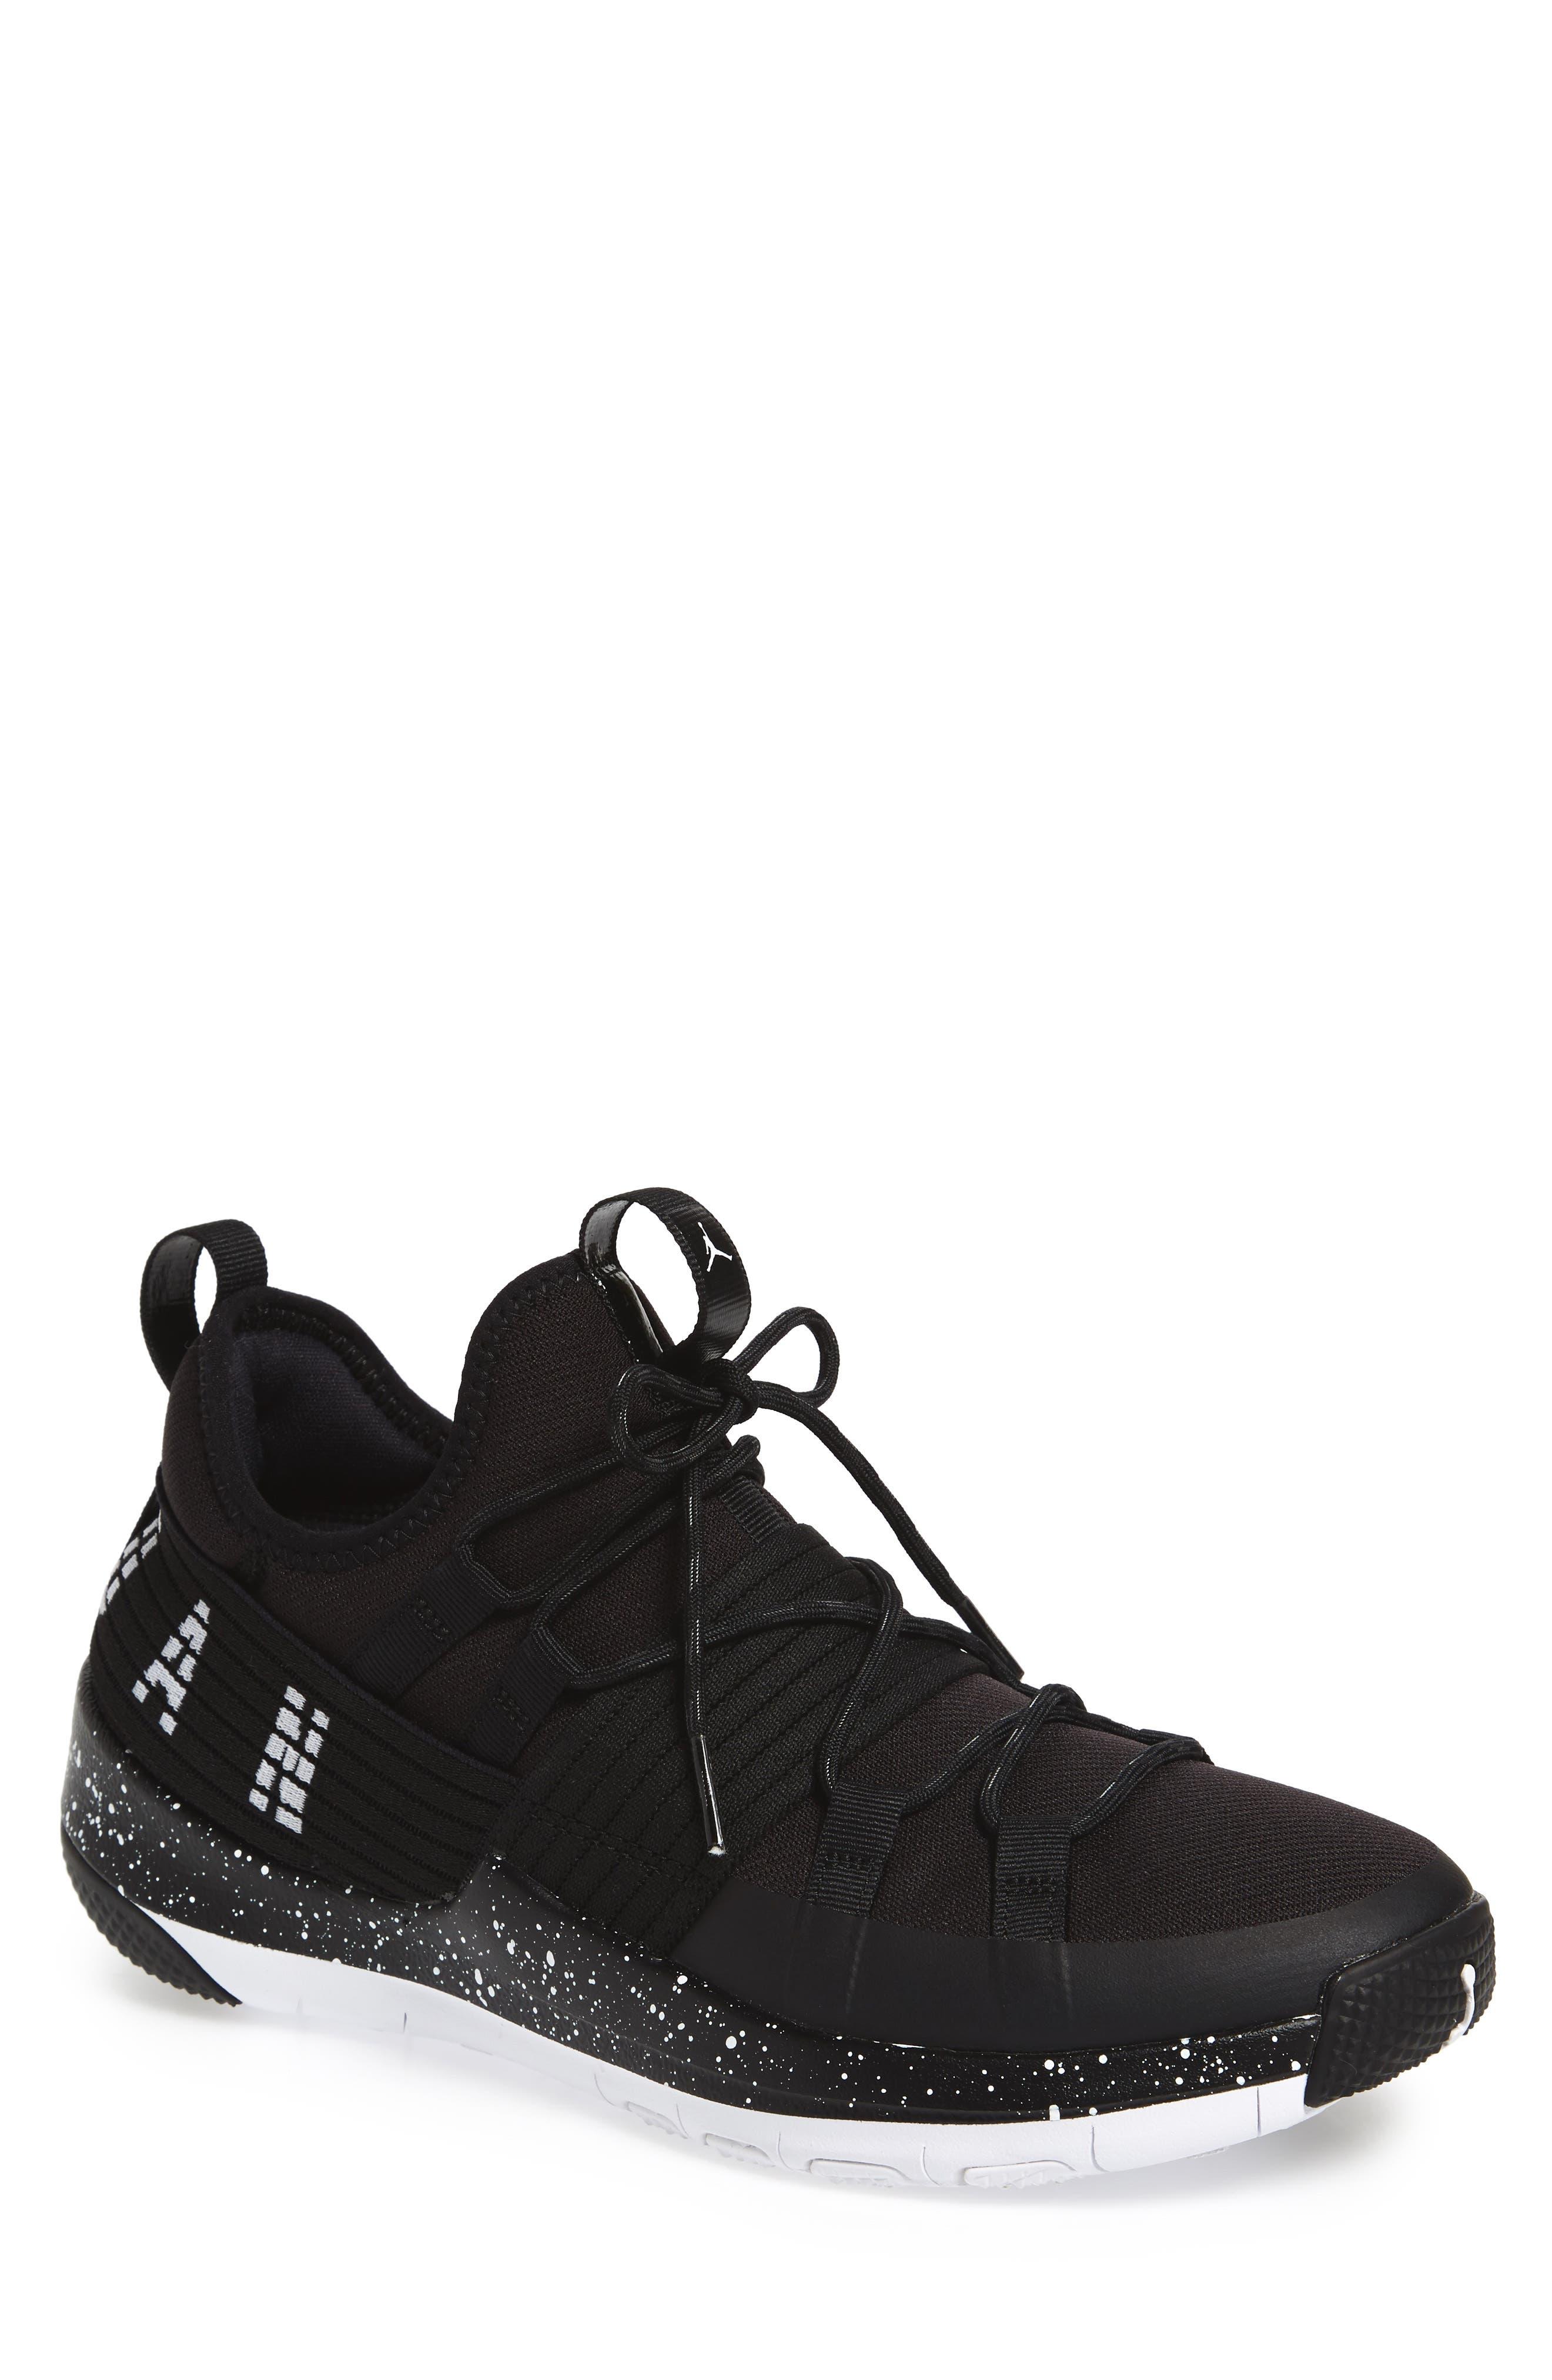 Jordan Trainer Pro Training Shoe,                         Main,                         color, 010